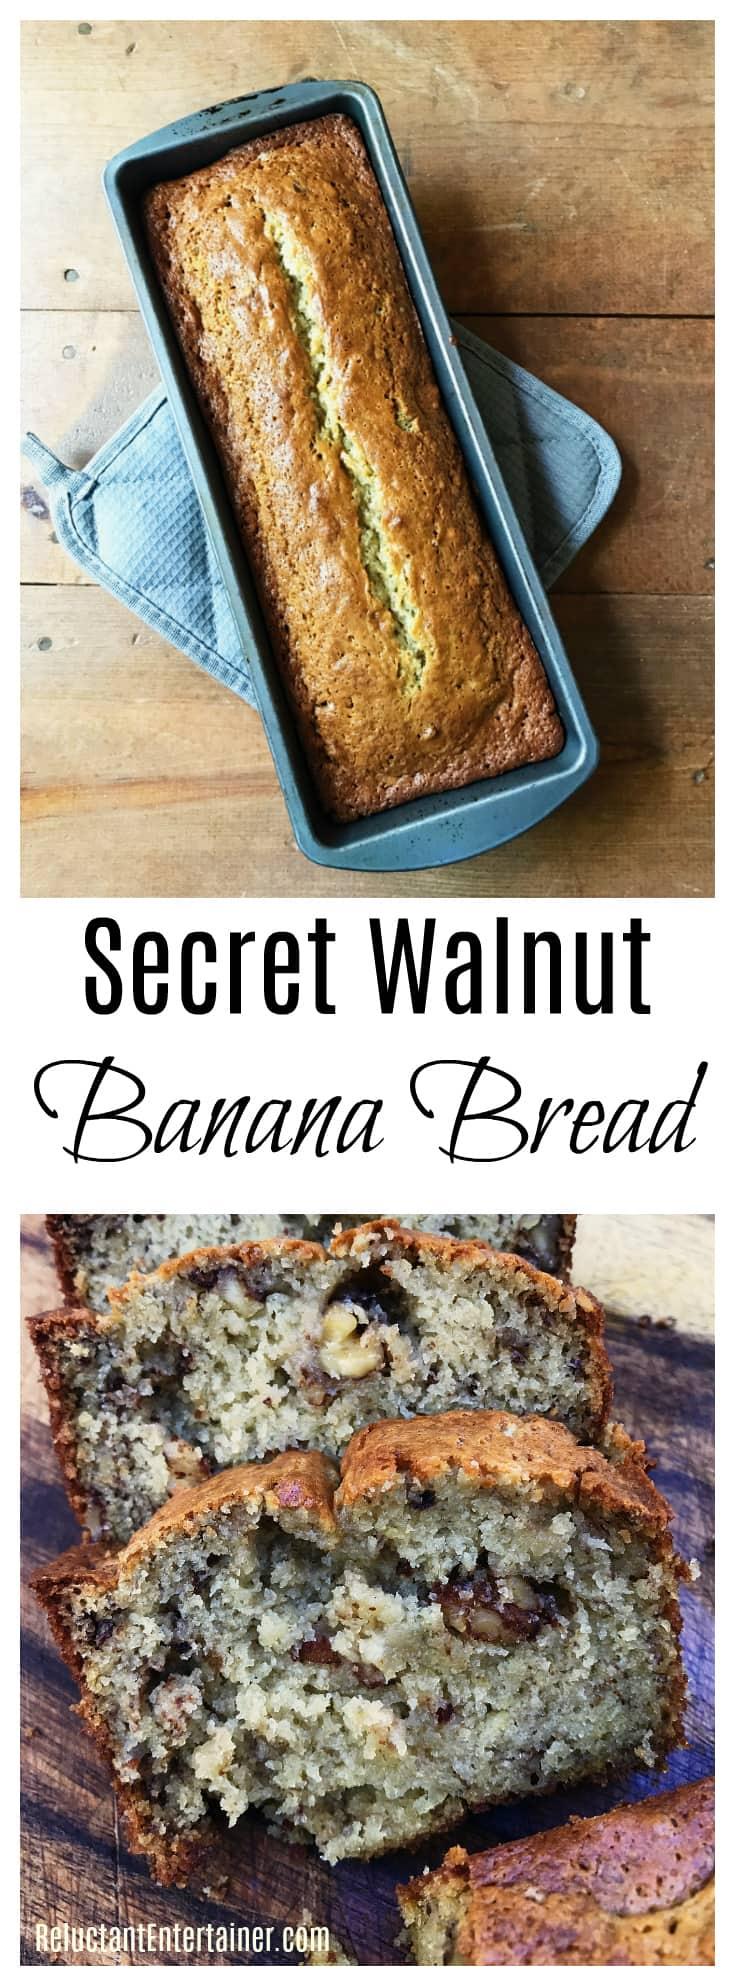 Secret Walnut Banana Bread Recipe